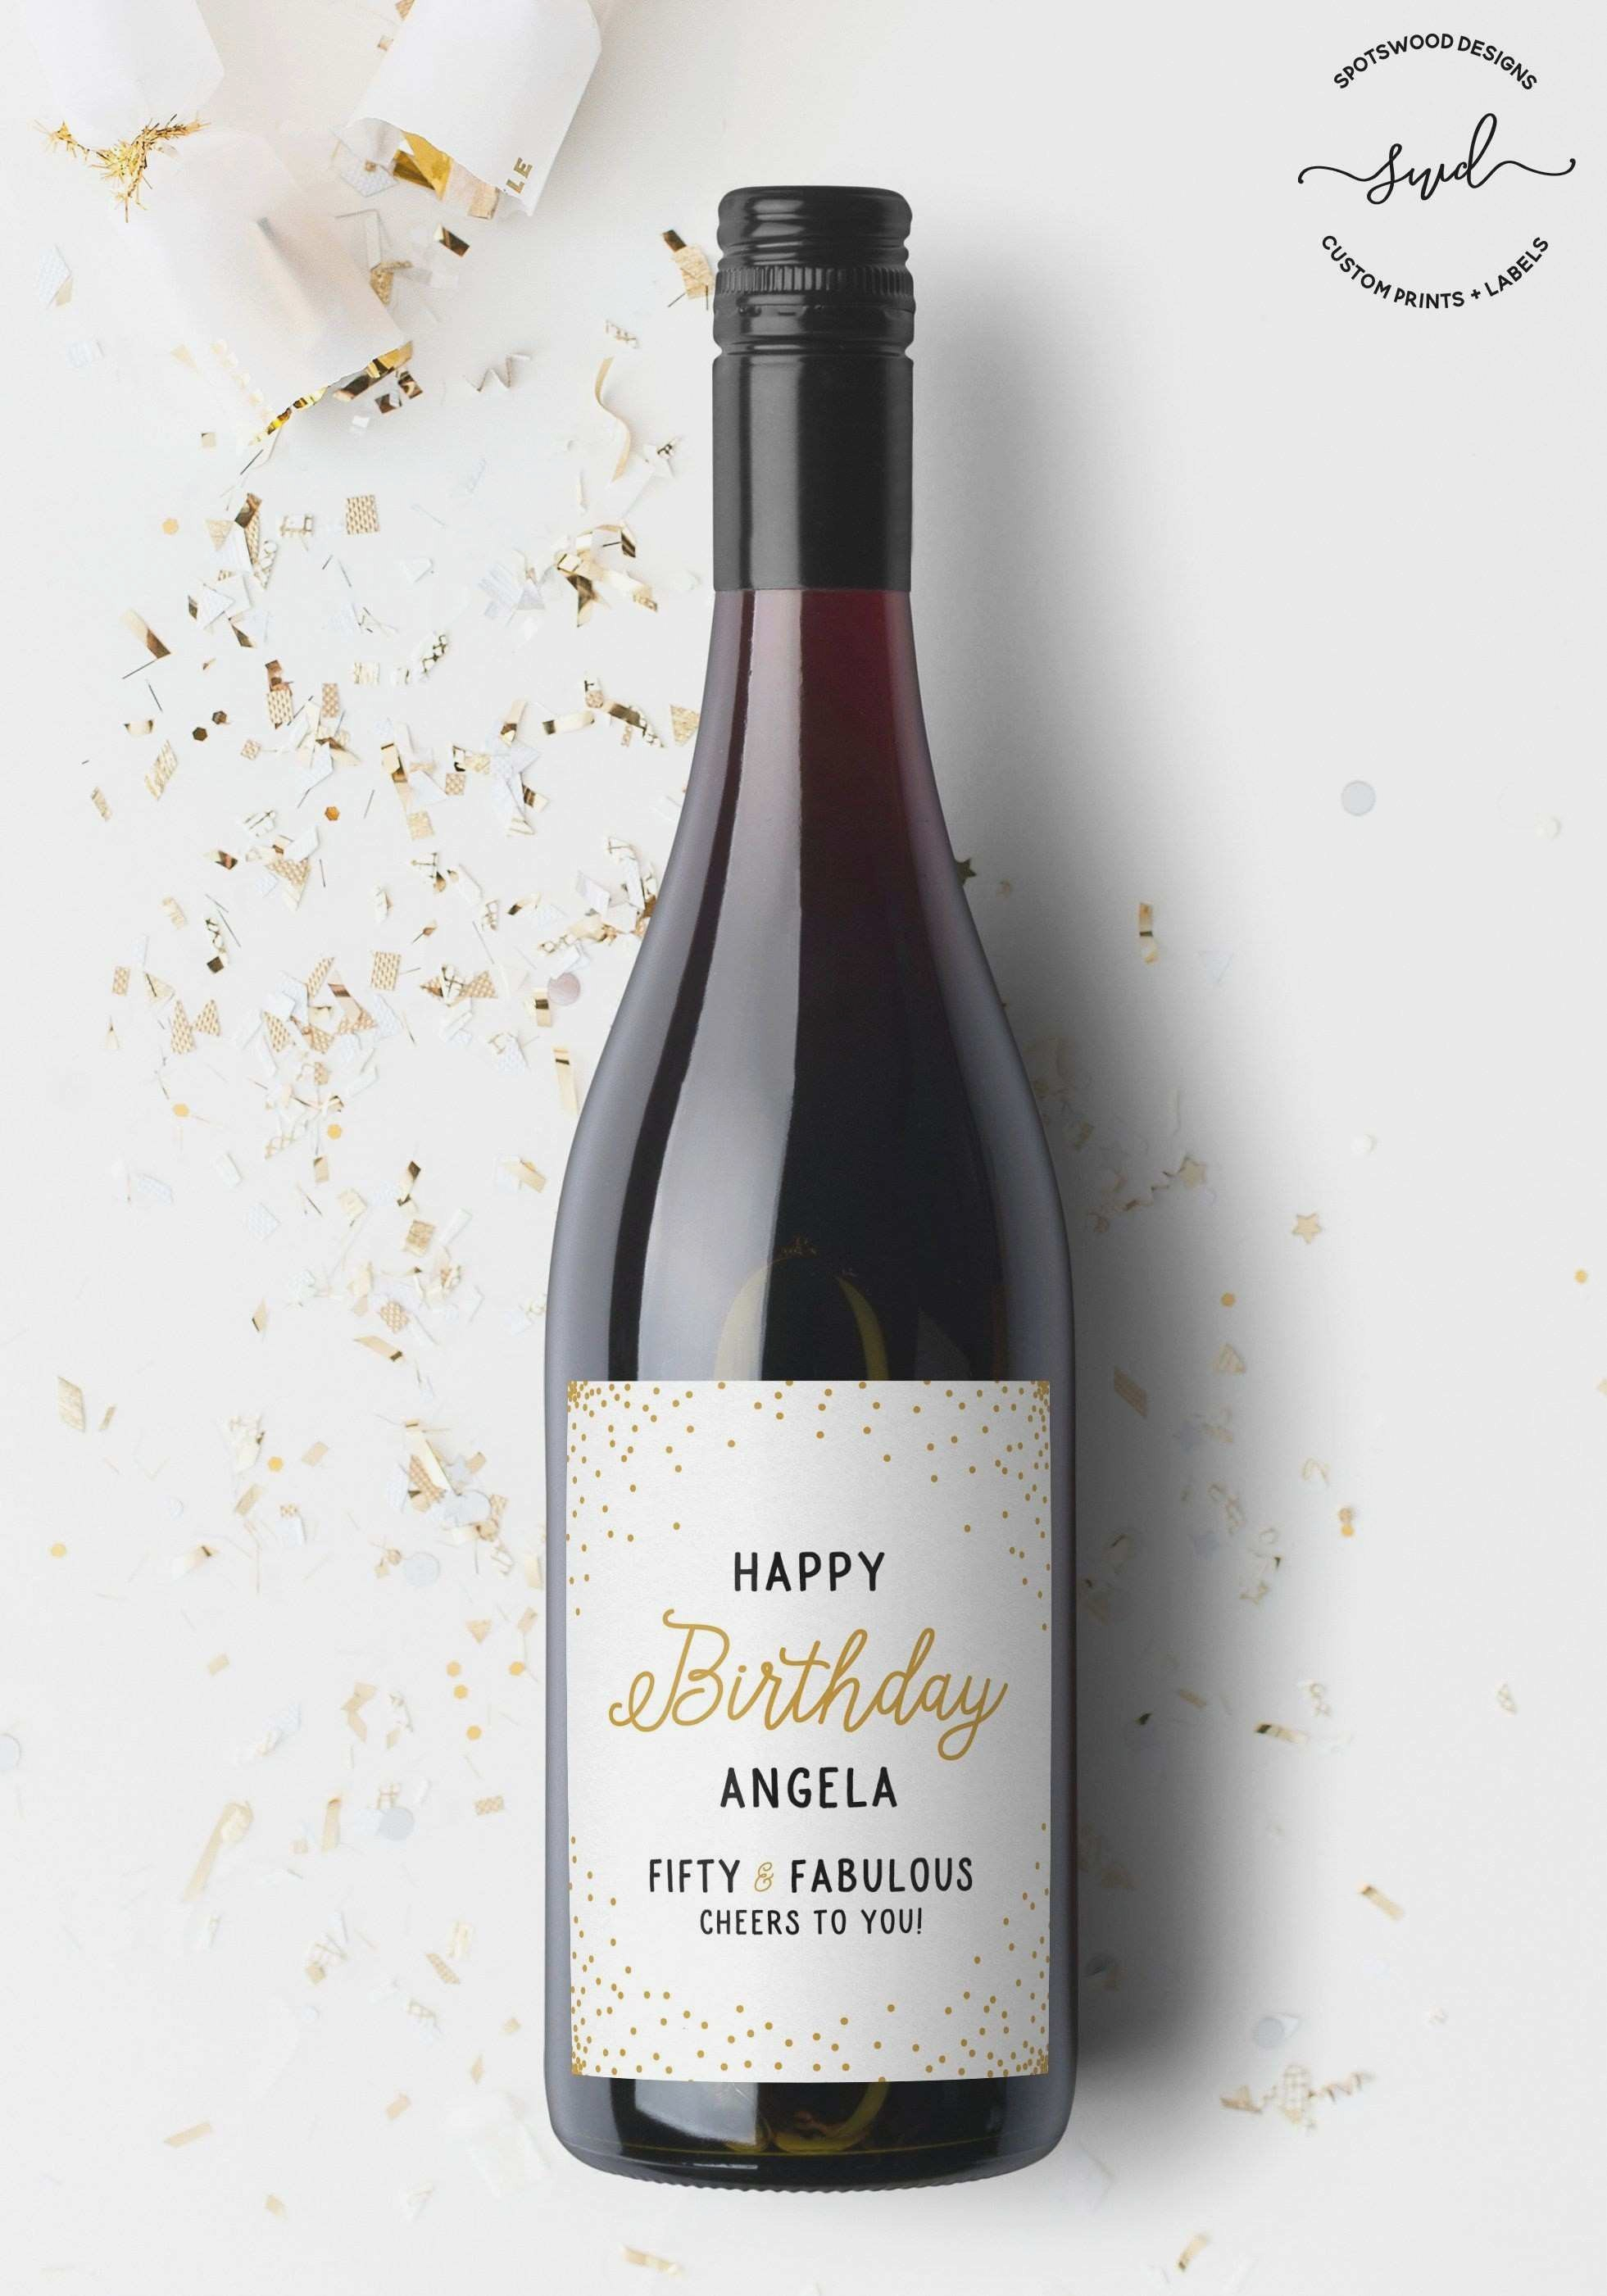 Simple Wine Label Design Templates Free  Acilmalumat For Blank Wine Label Template